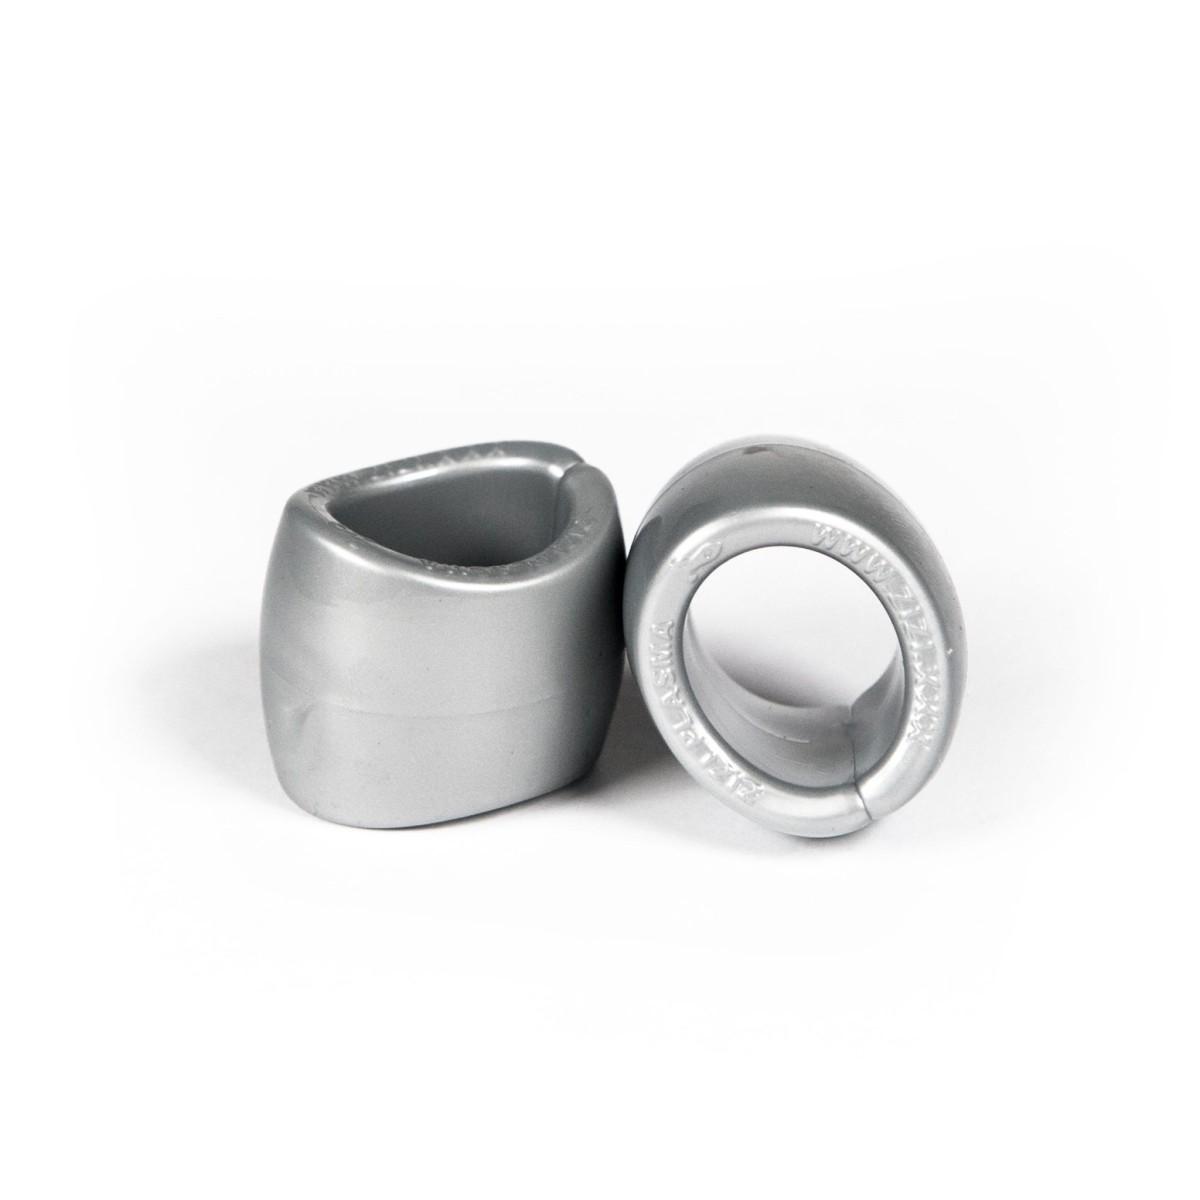 Zizi Plasma Cock Ring & Ball Stretcher 2 pcs Silver